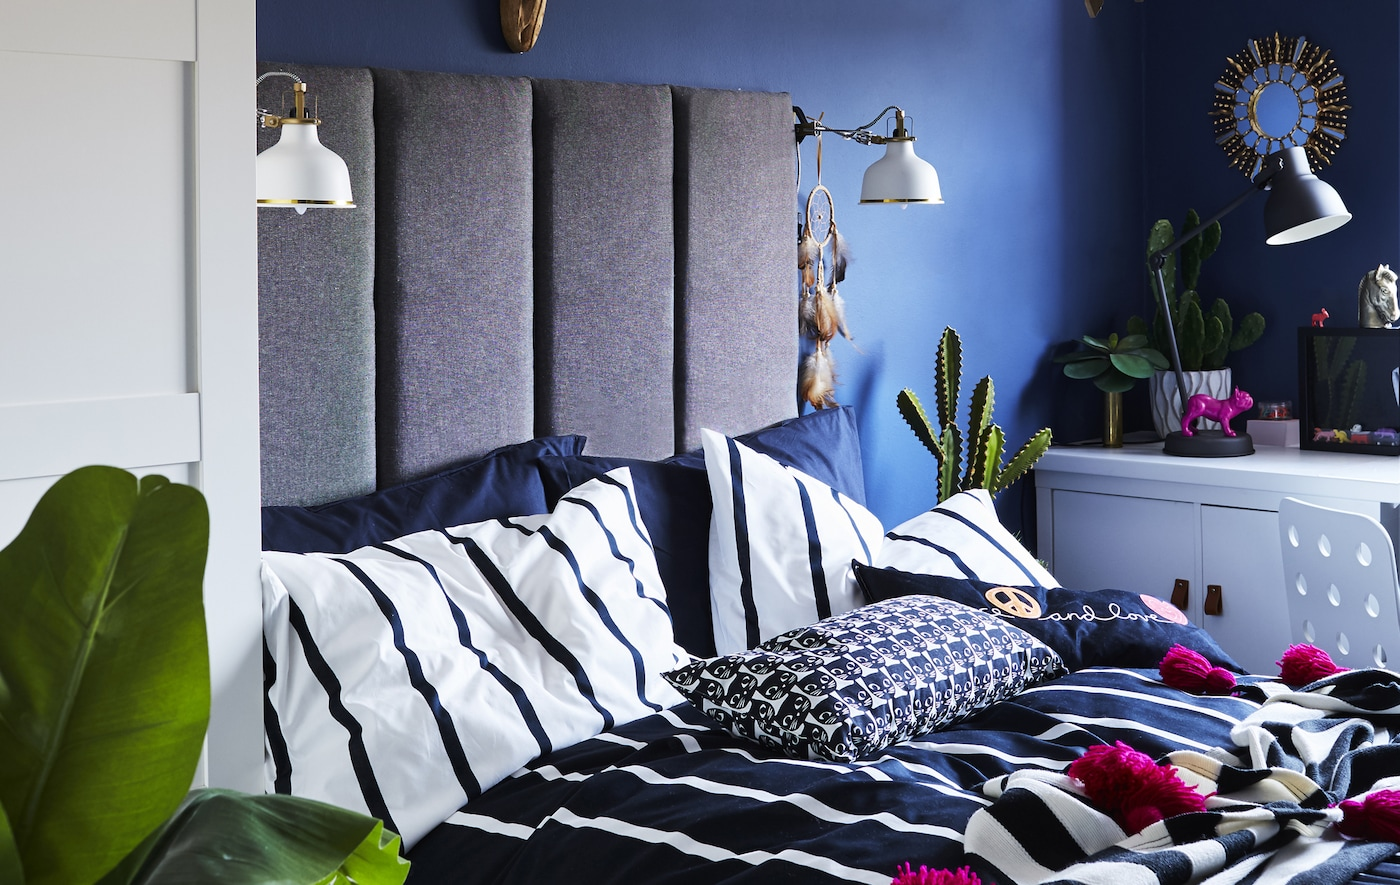 Dečja soba plavih zidova i s monohromatskom krevetninom.